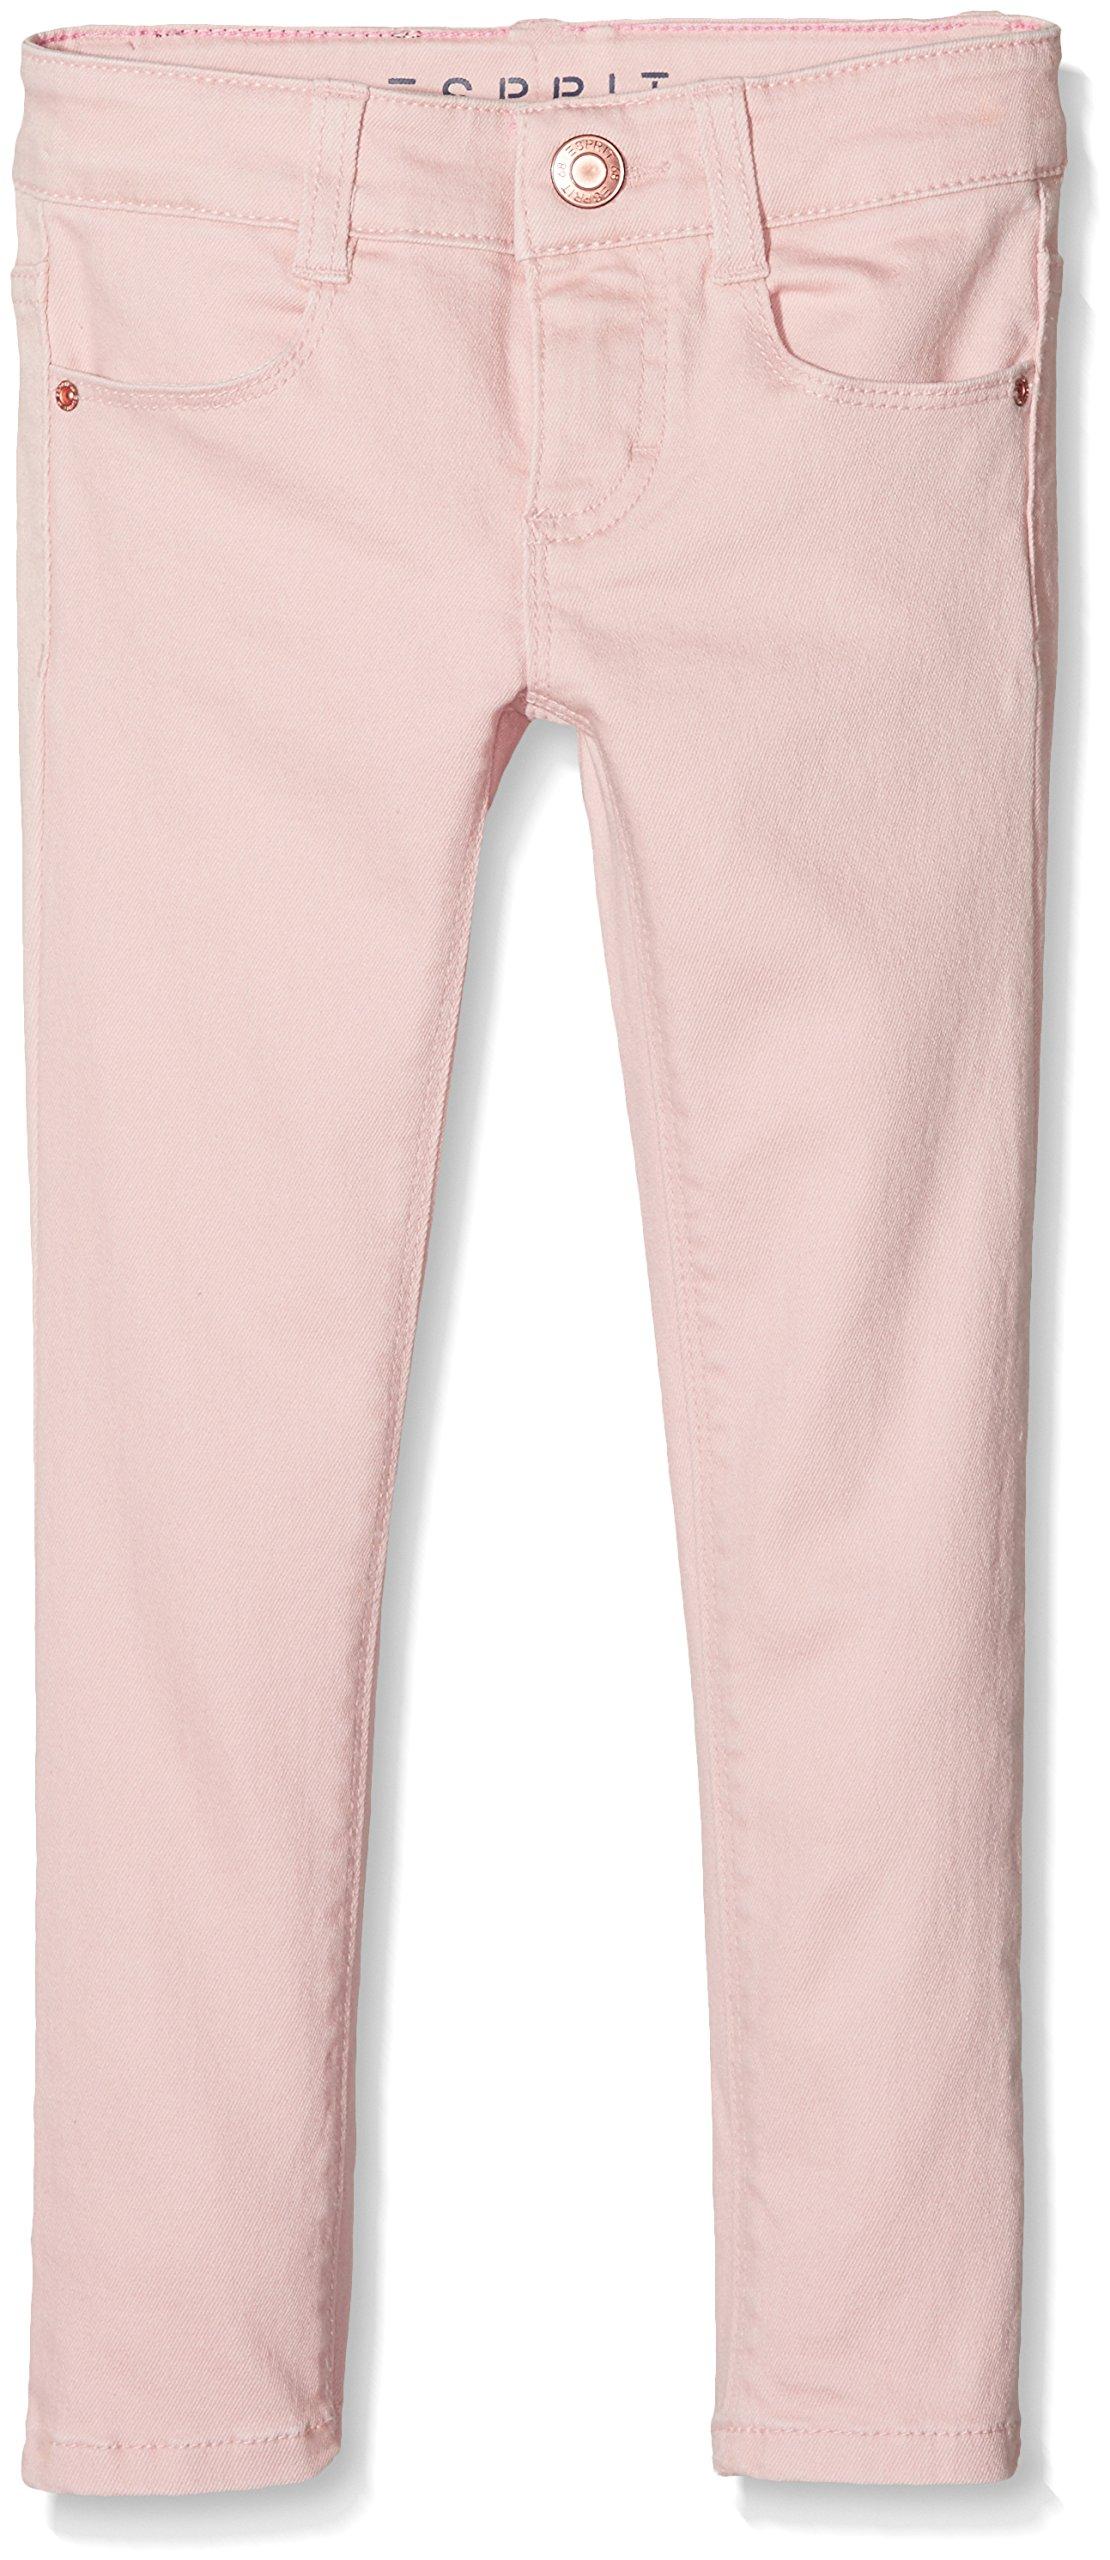 Esprit Kids Hose Pantalones para Niños